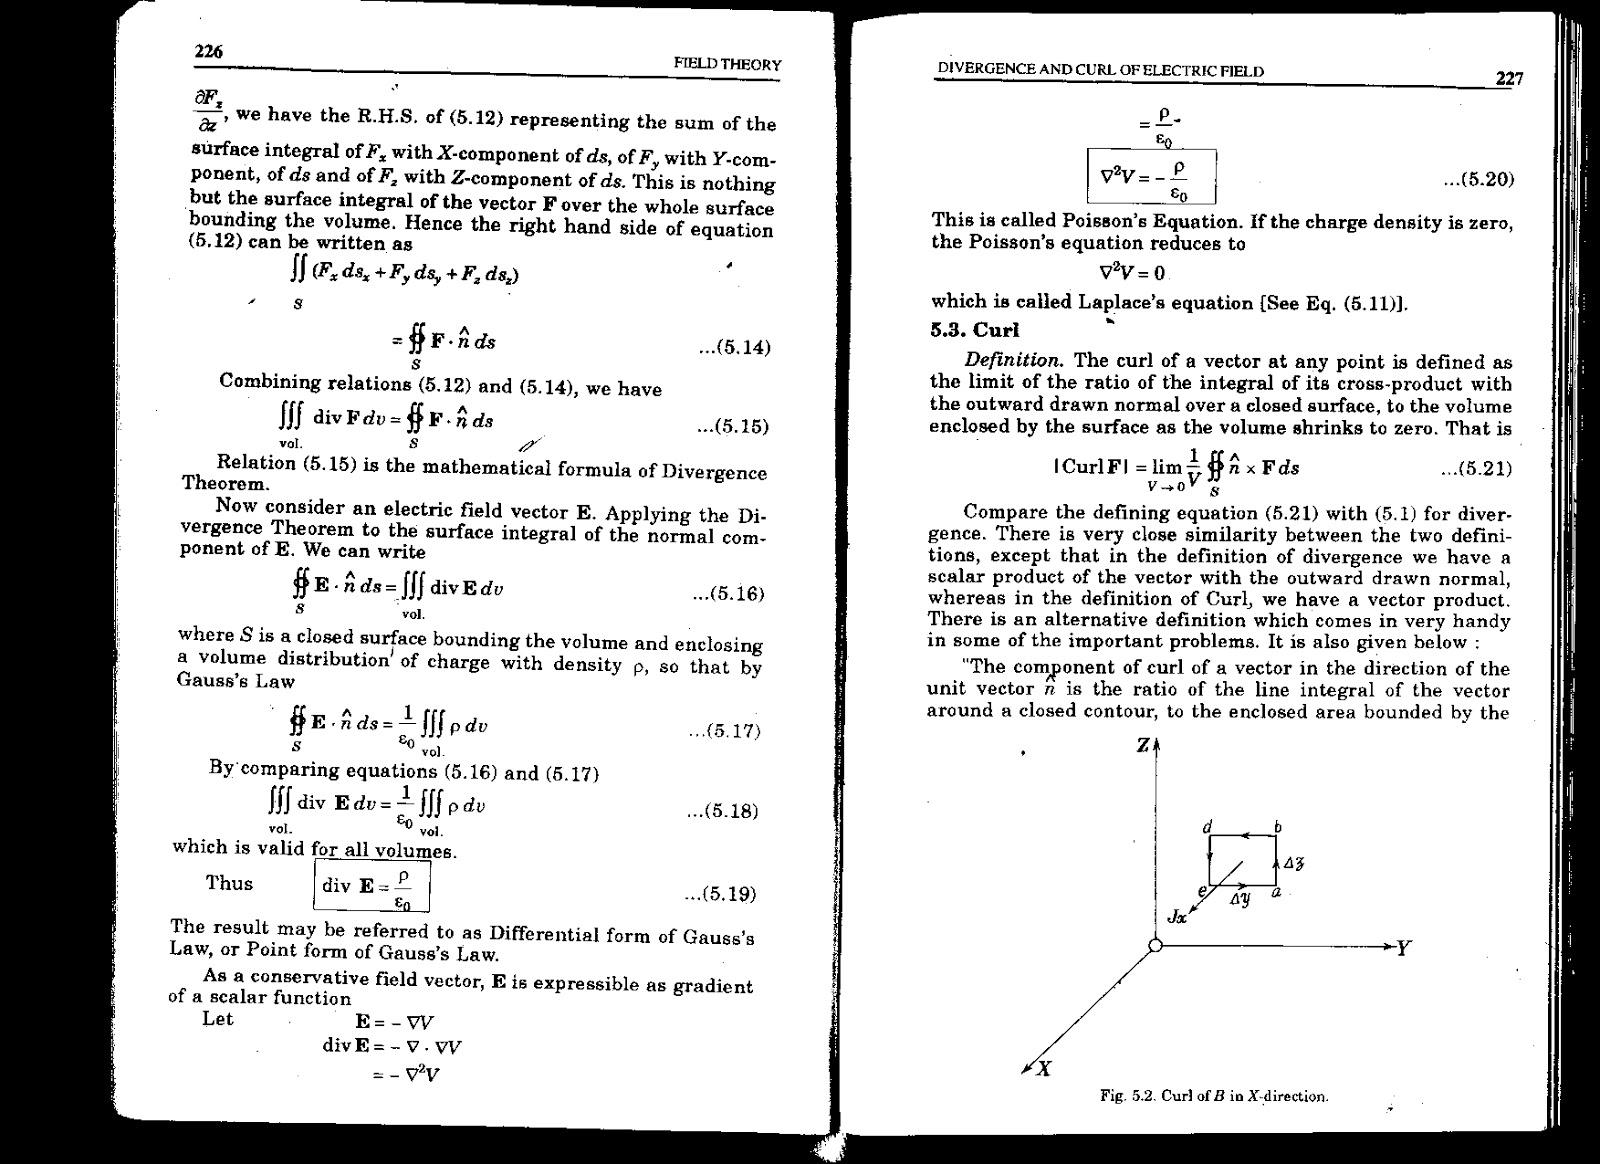 Transistor Biasing Circuits Jbgupta Electrical Engg Lectures Electronic Device Circuit Jb Gupta Posted 16th November 2012 By Ramasubramanian S